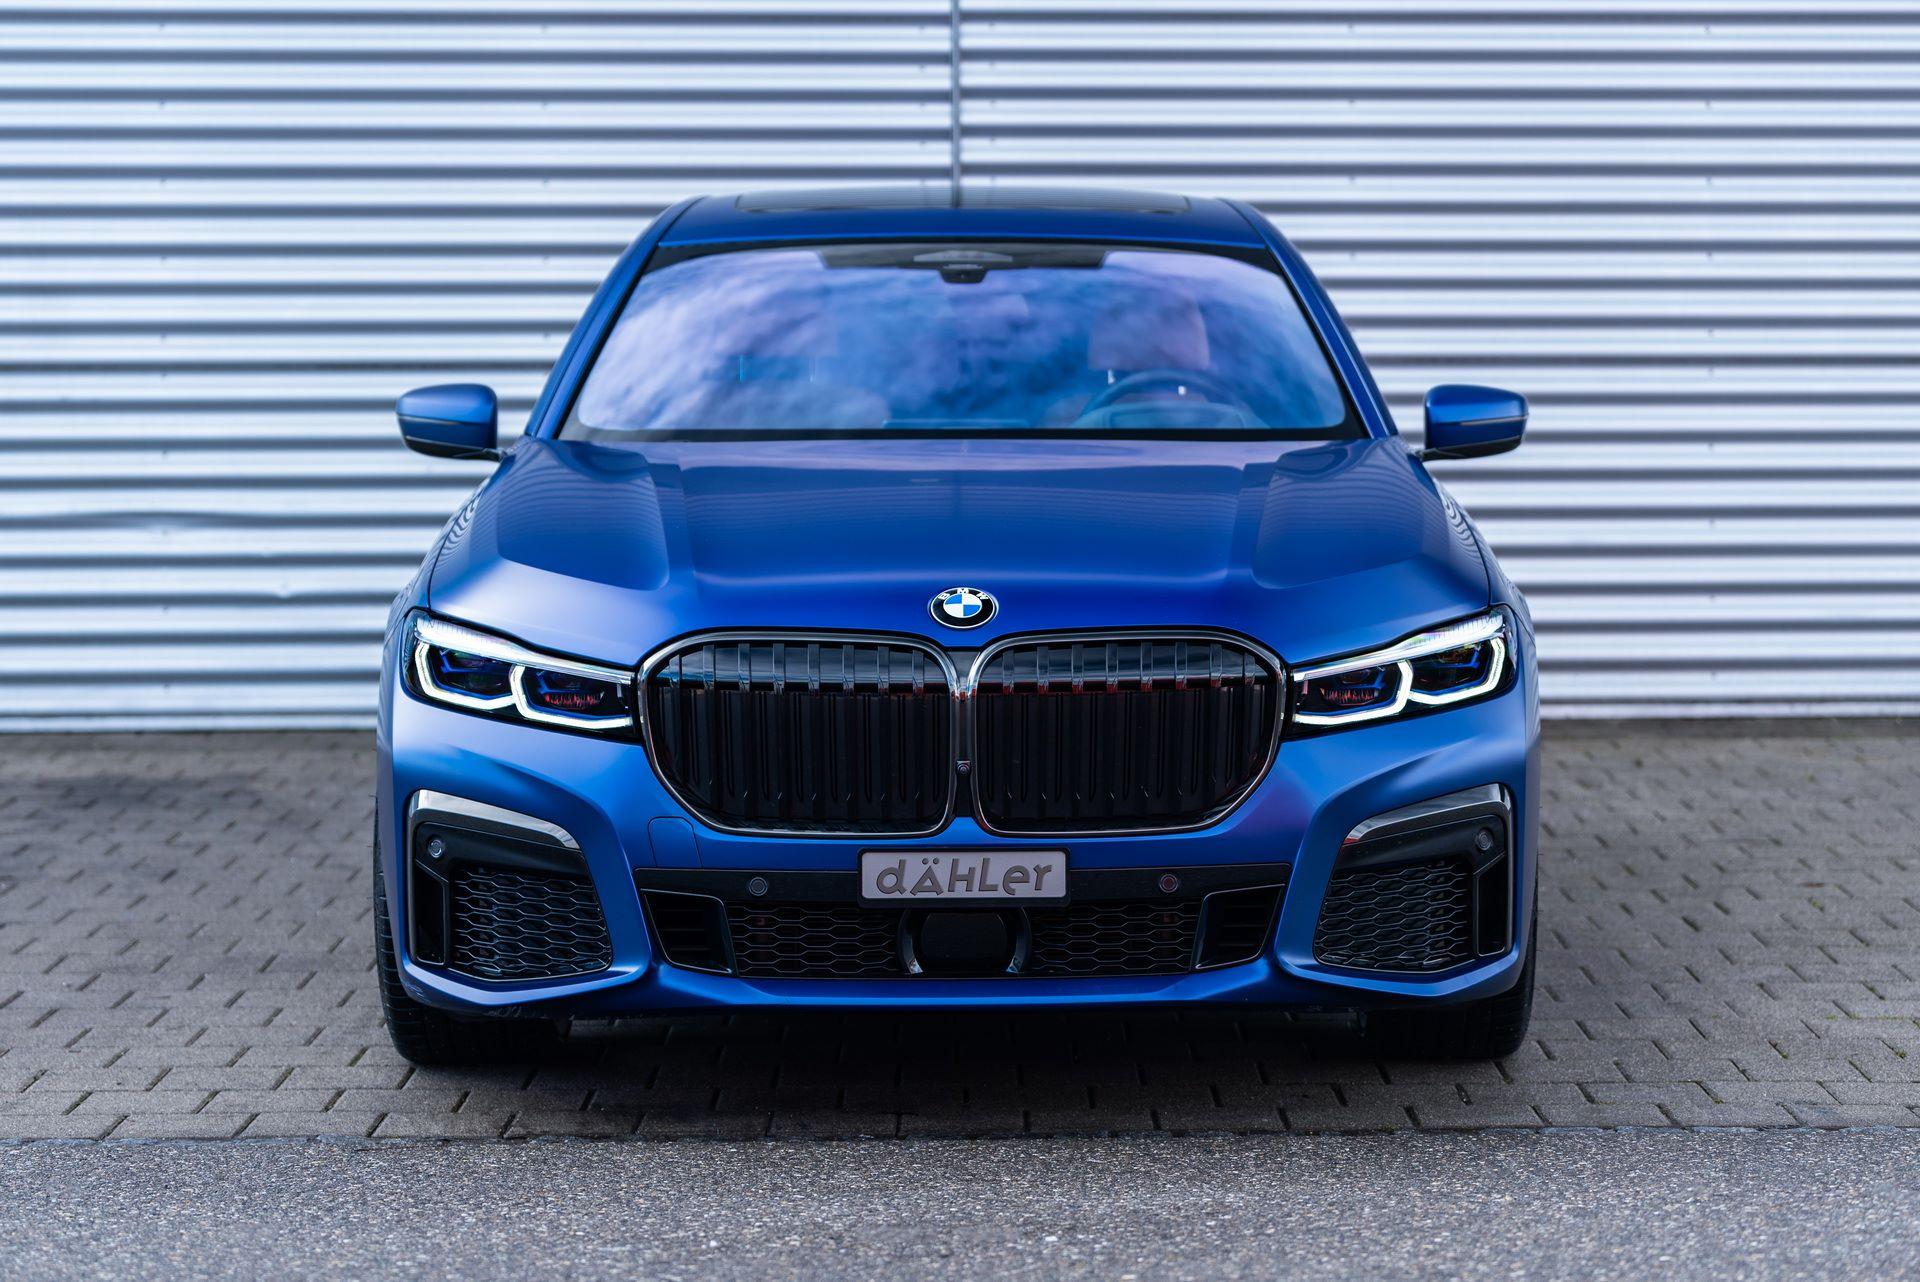 BMW-745Le-xDrive-by-Dahler-2